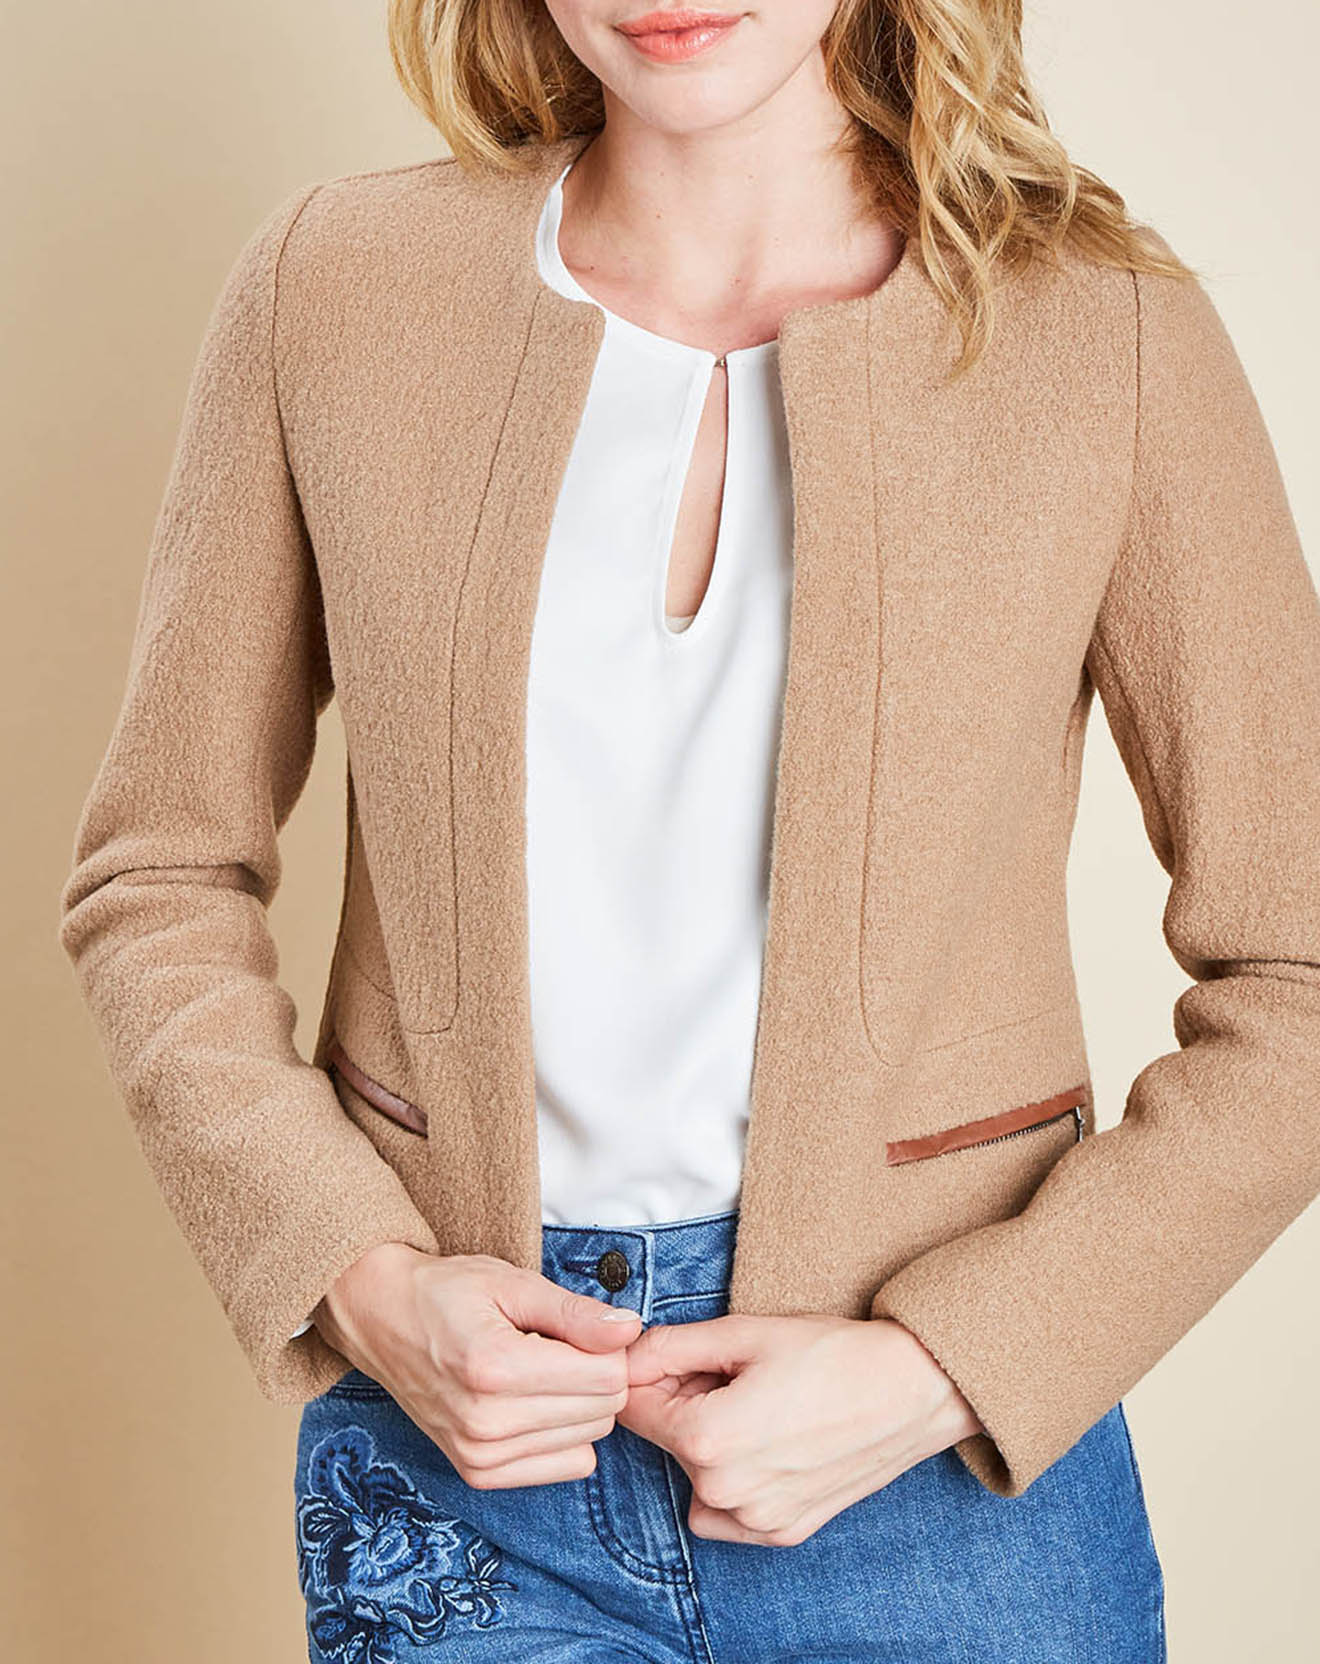 Veste en laine Cathy courte beige moyen - Caroll - Modalova